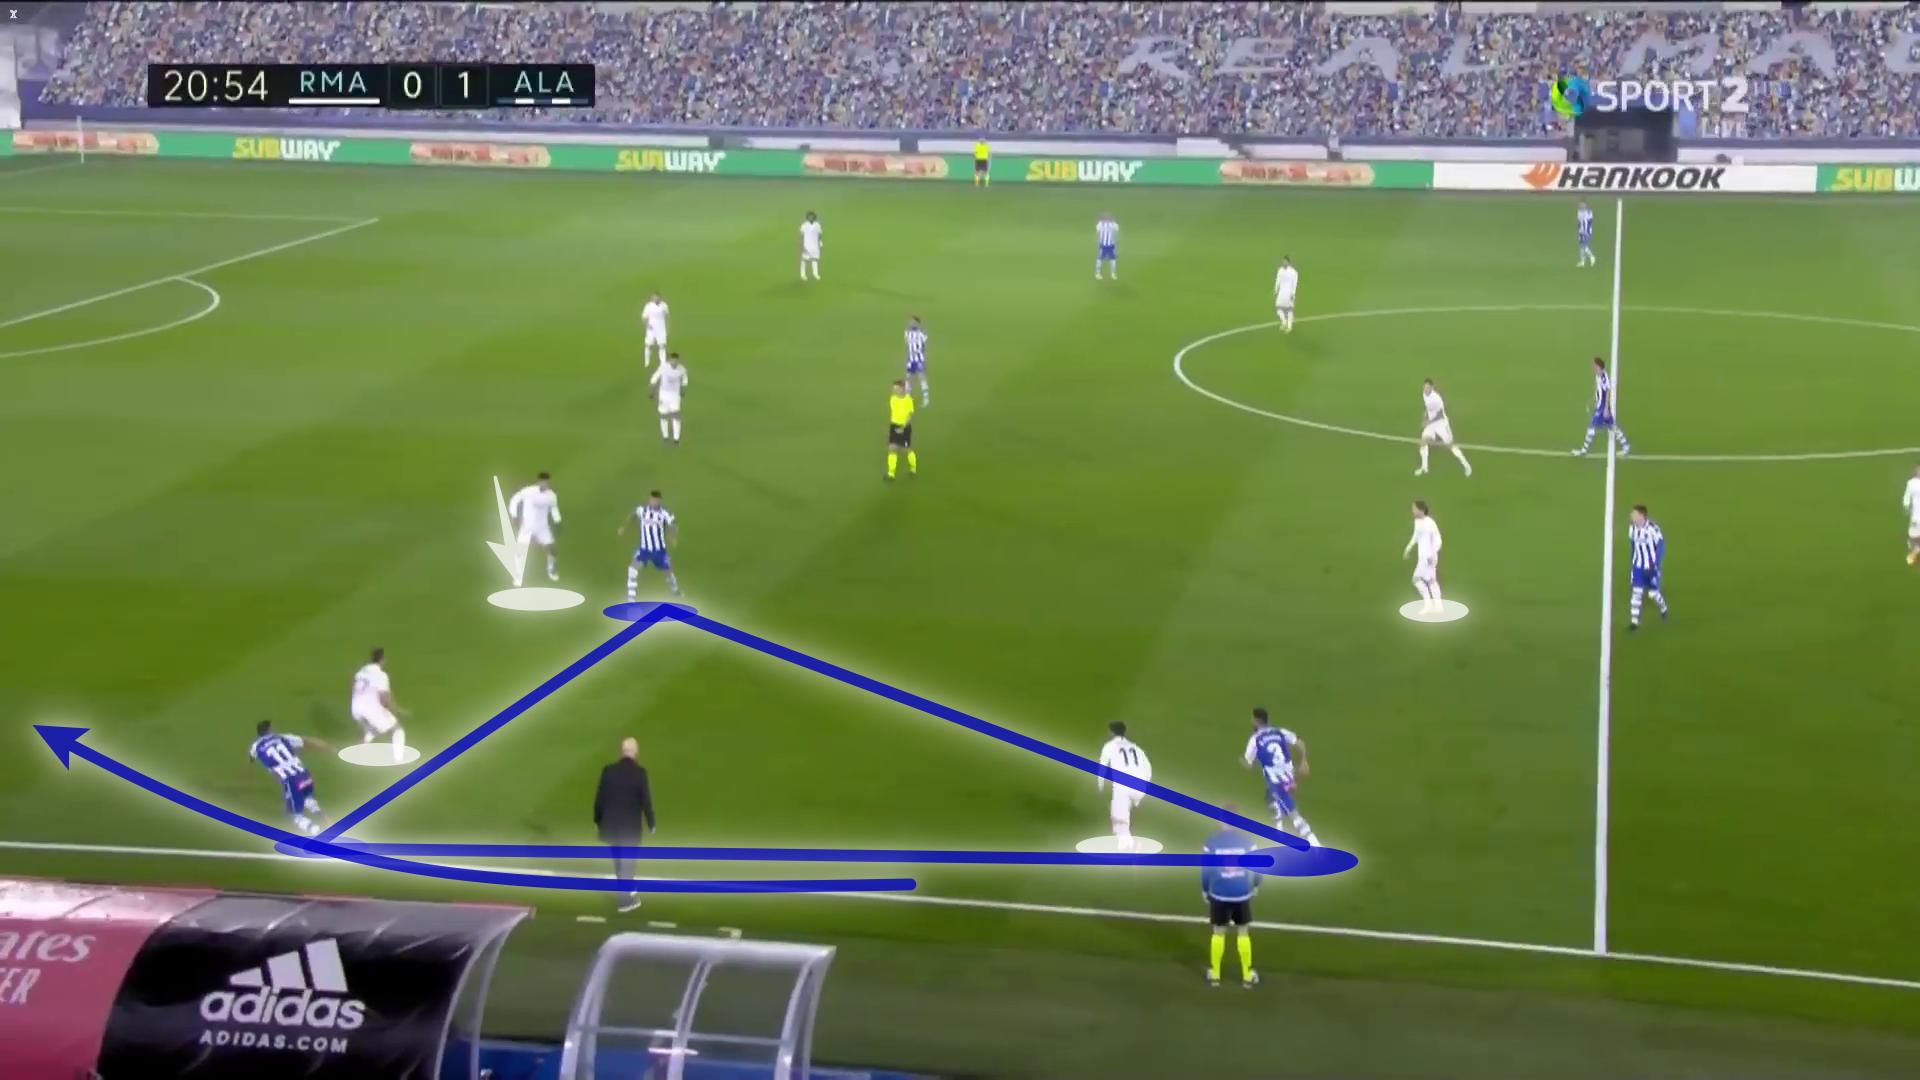 La Liga 2020/21: Real Madrid vs Alaves - tactical analysis - tactics